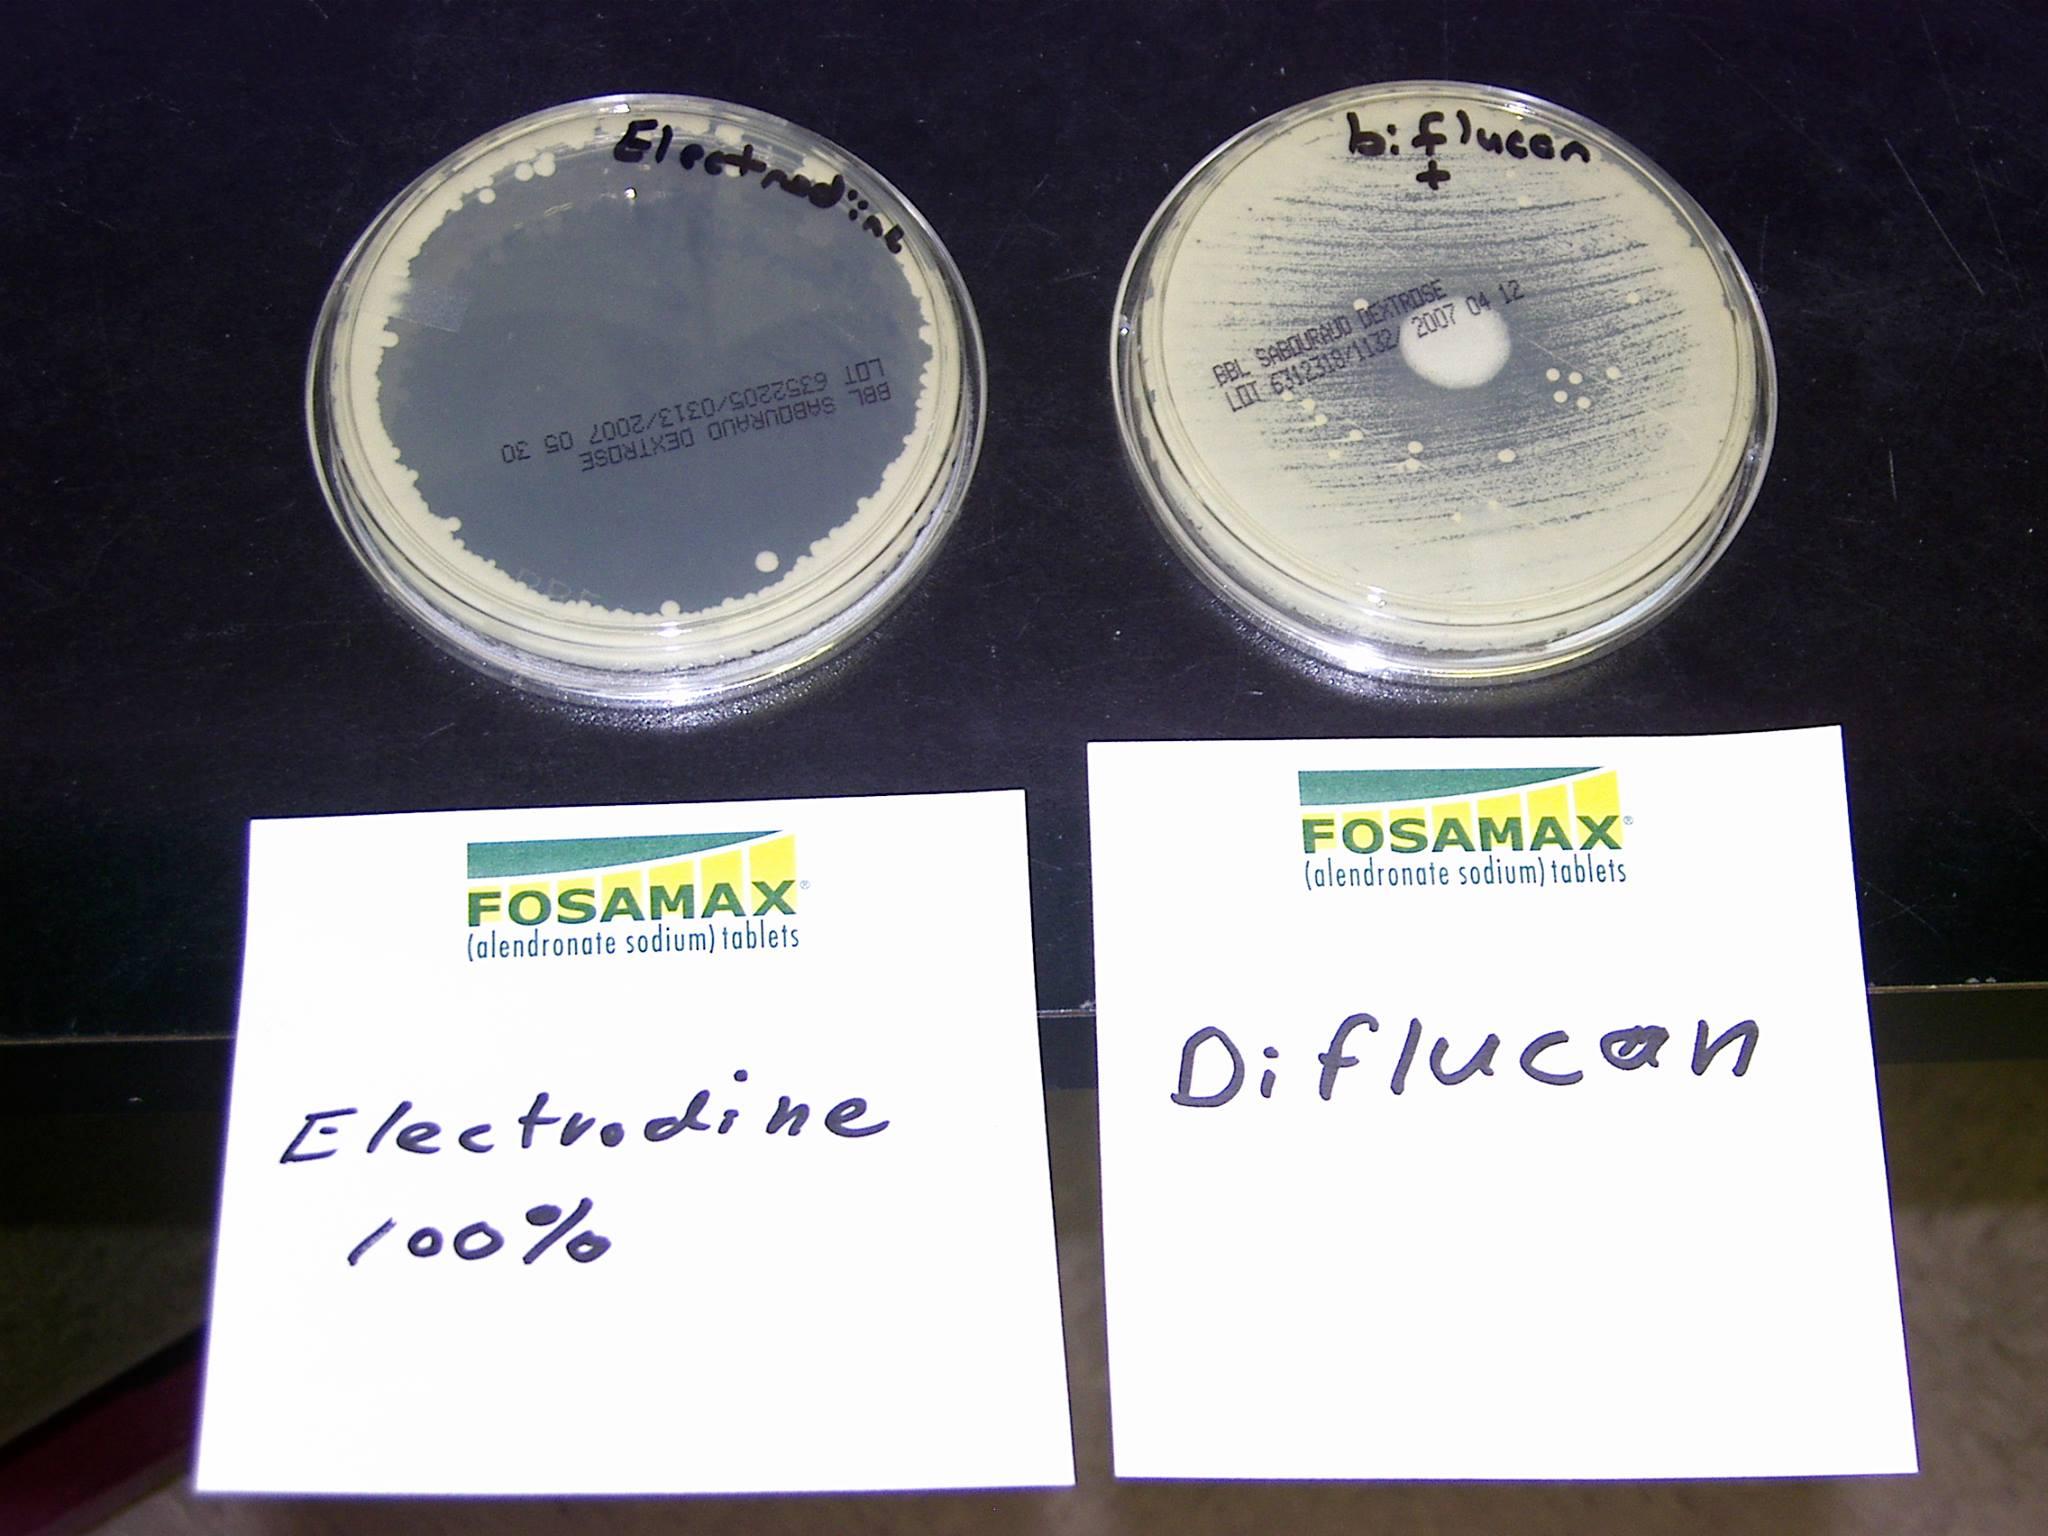 Petri – Electrodine vs Difulcan